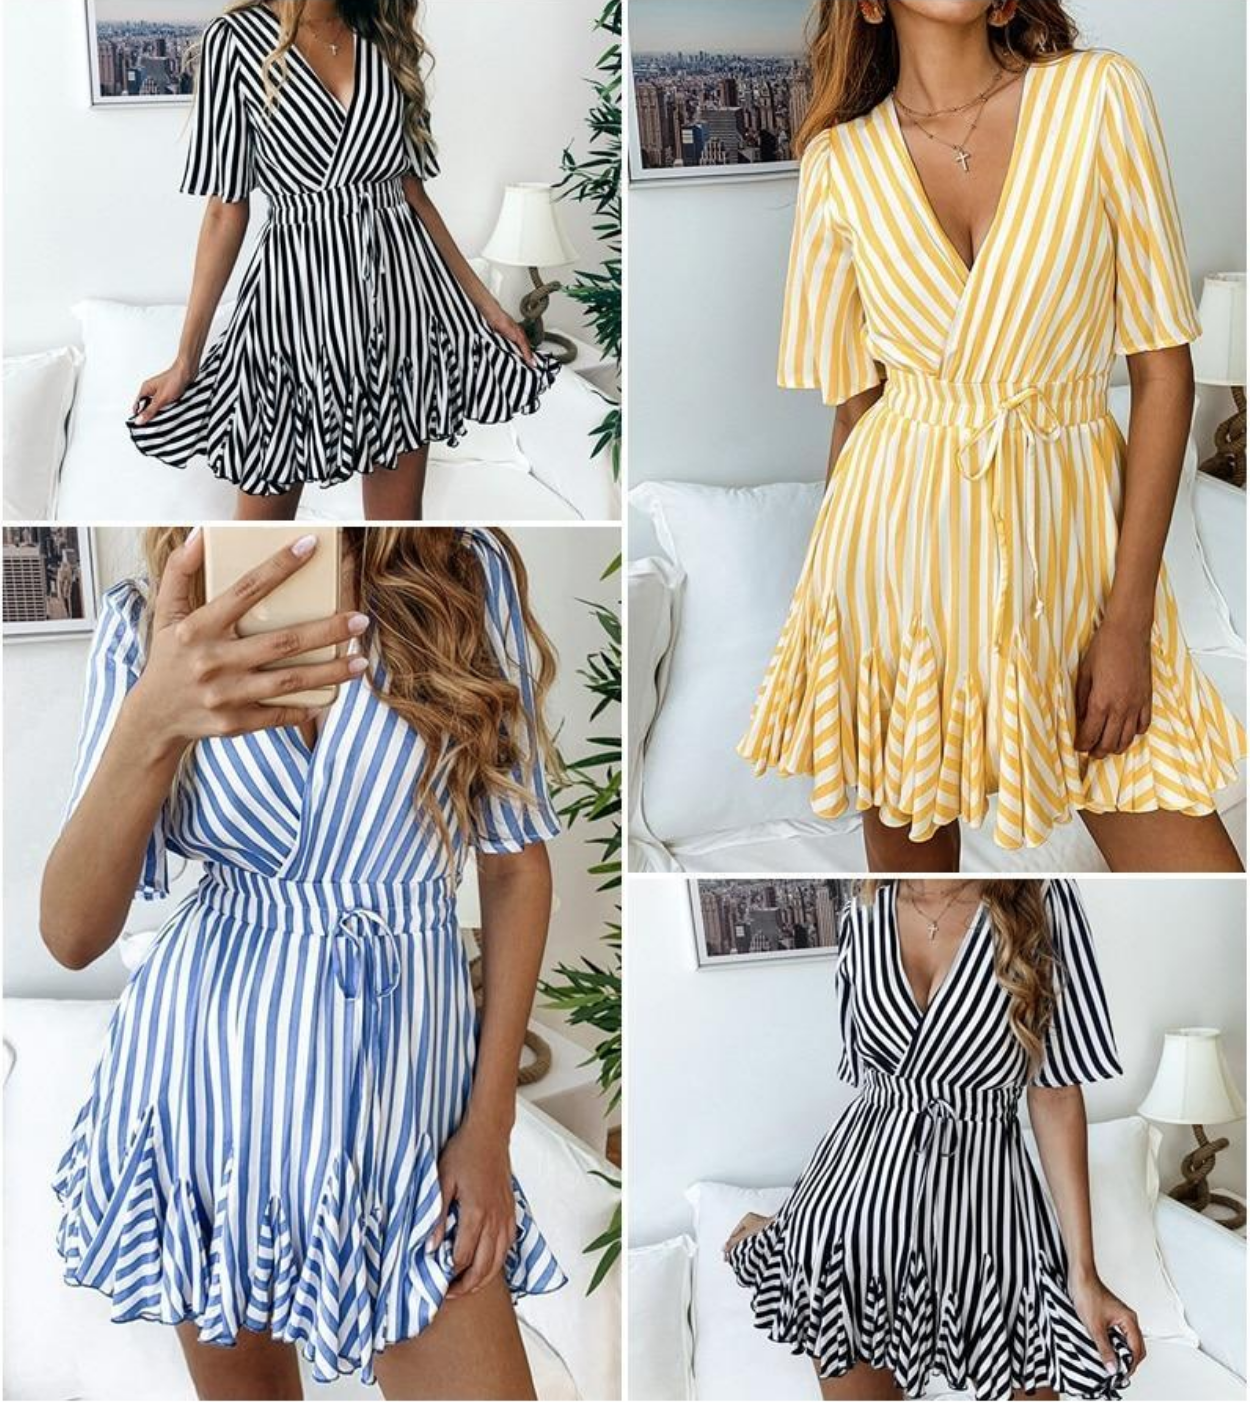 Striped Casual Honeymoon Perfect Vintage Striped Dress Cotton Short Dresses Cotton Dress Summer [ 1402 x 1250 Pixel ]